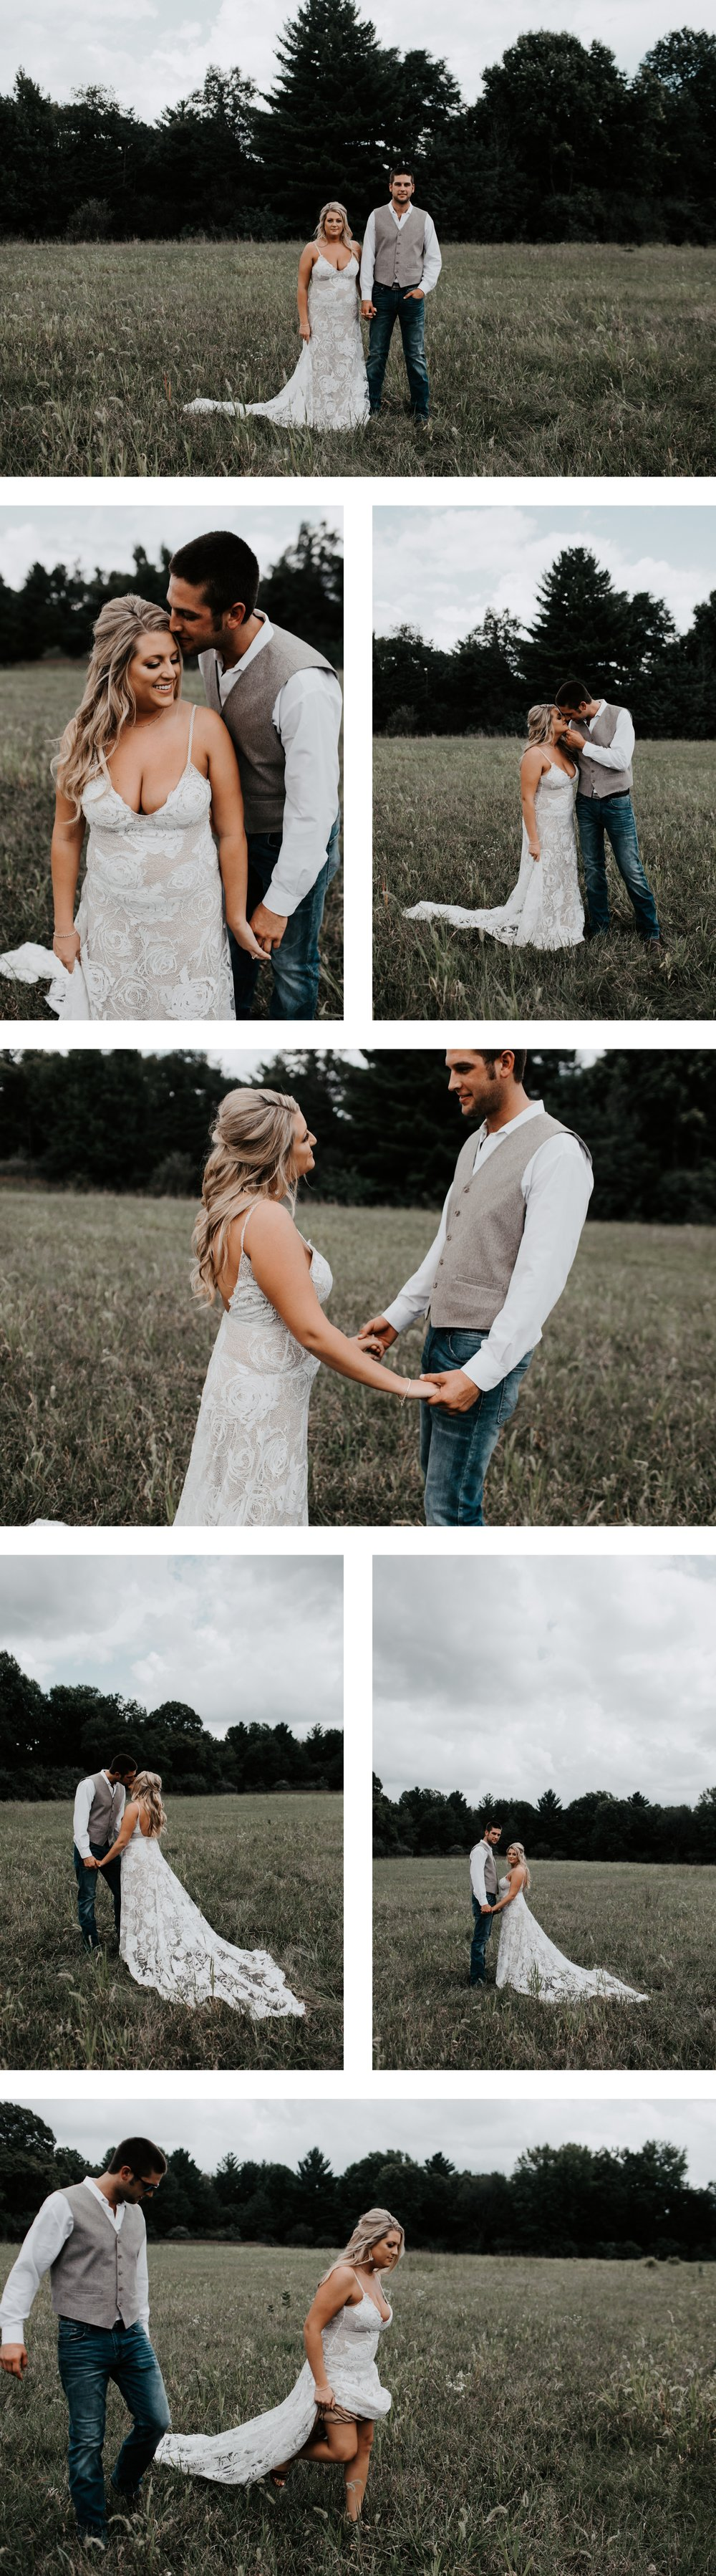 The Pudik Wedding 6.jpg